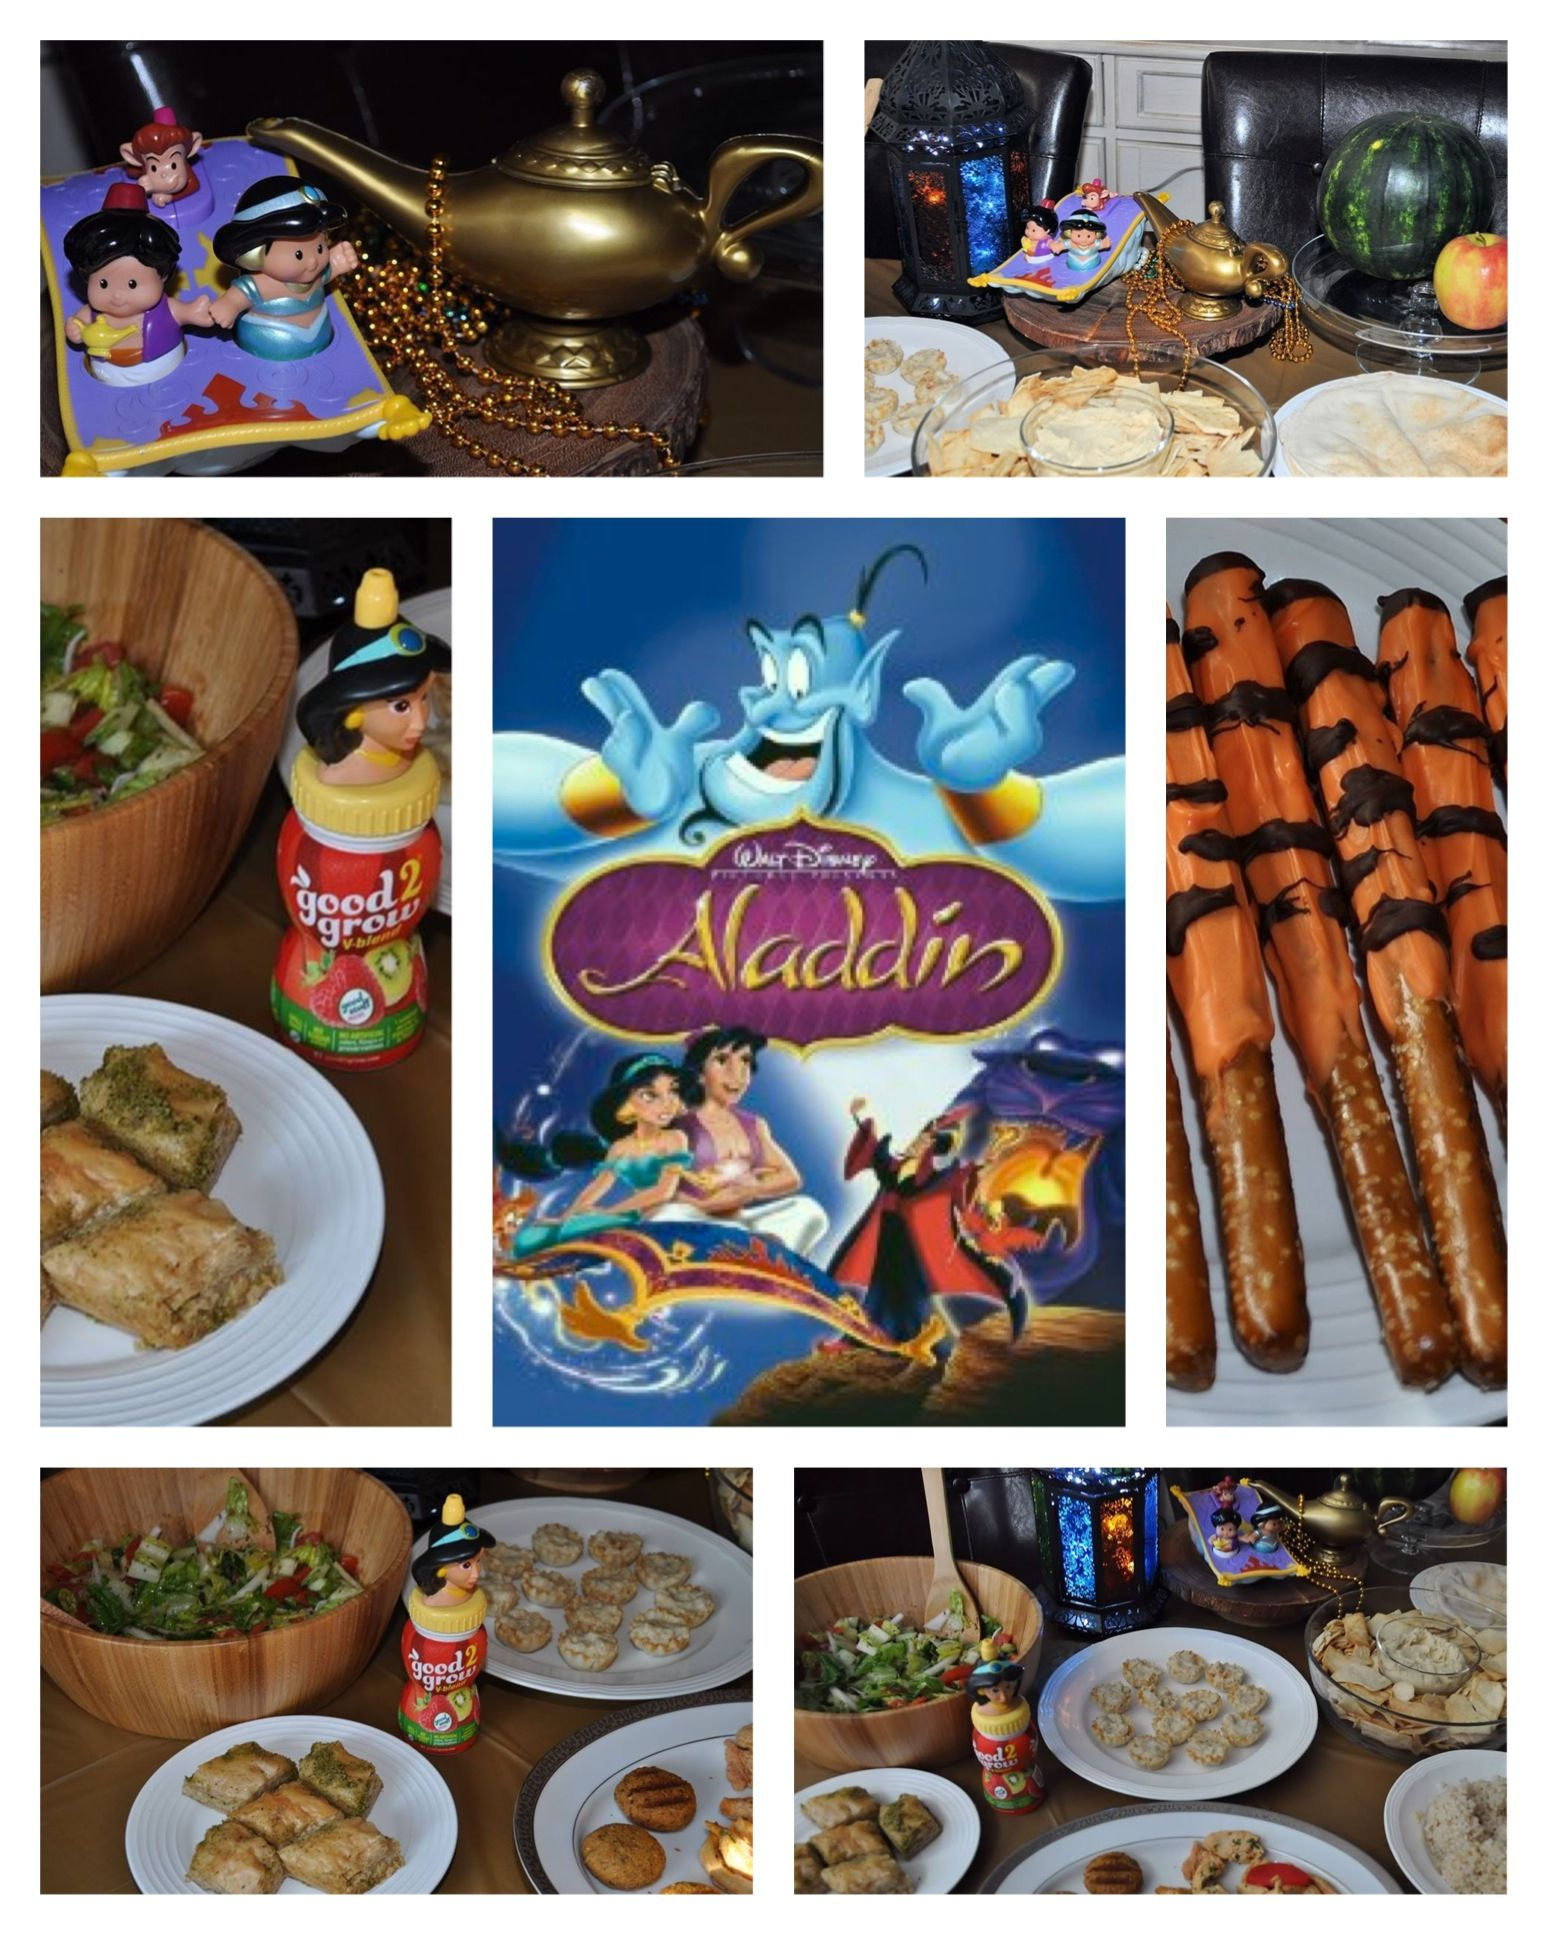 Top 10 Appetizers at Walt Disney World Appetizers